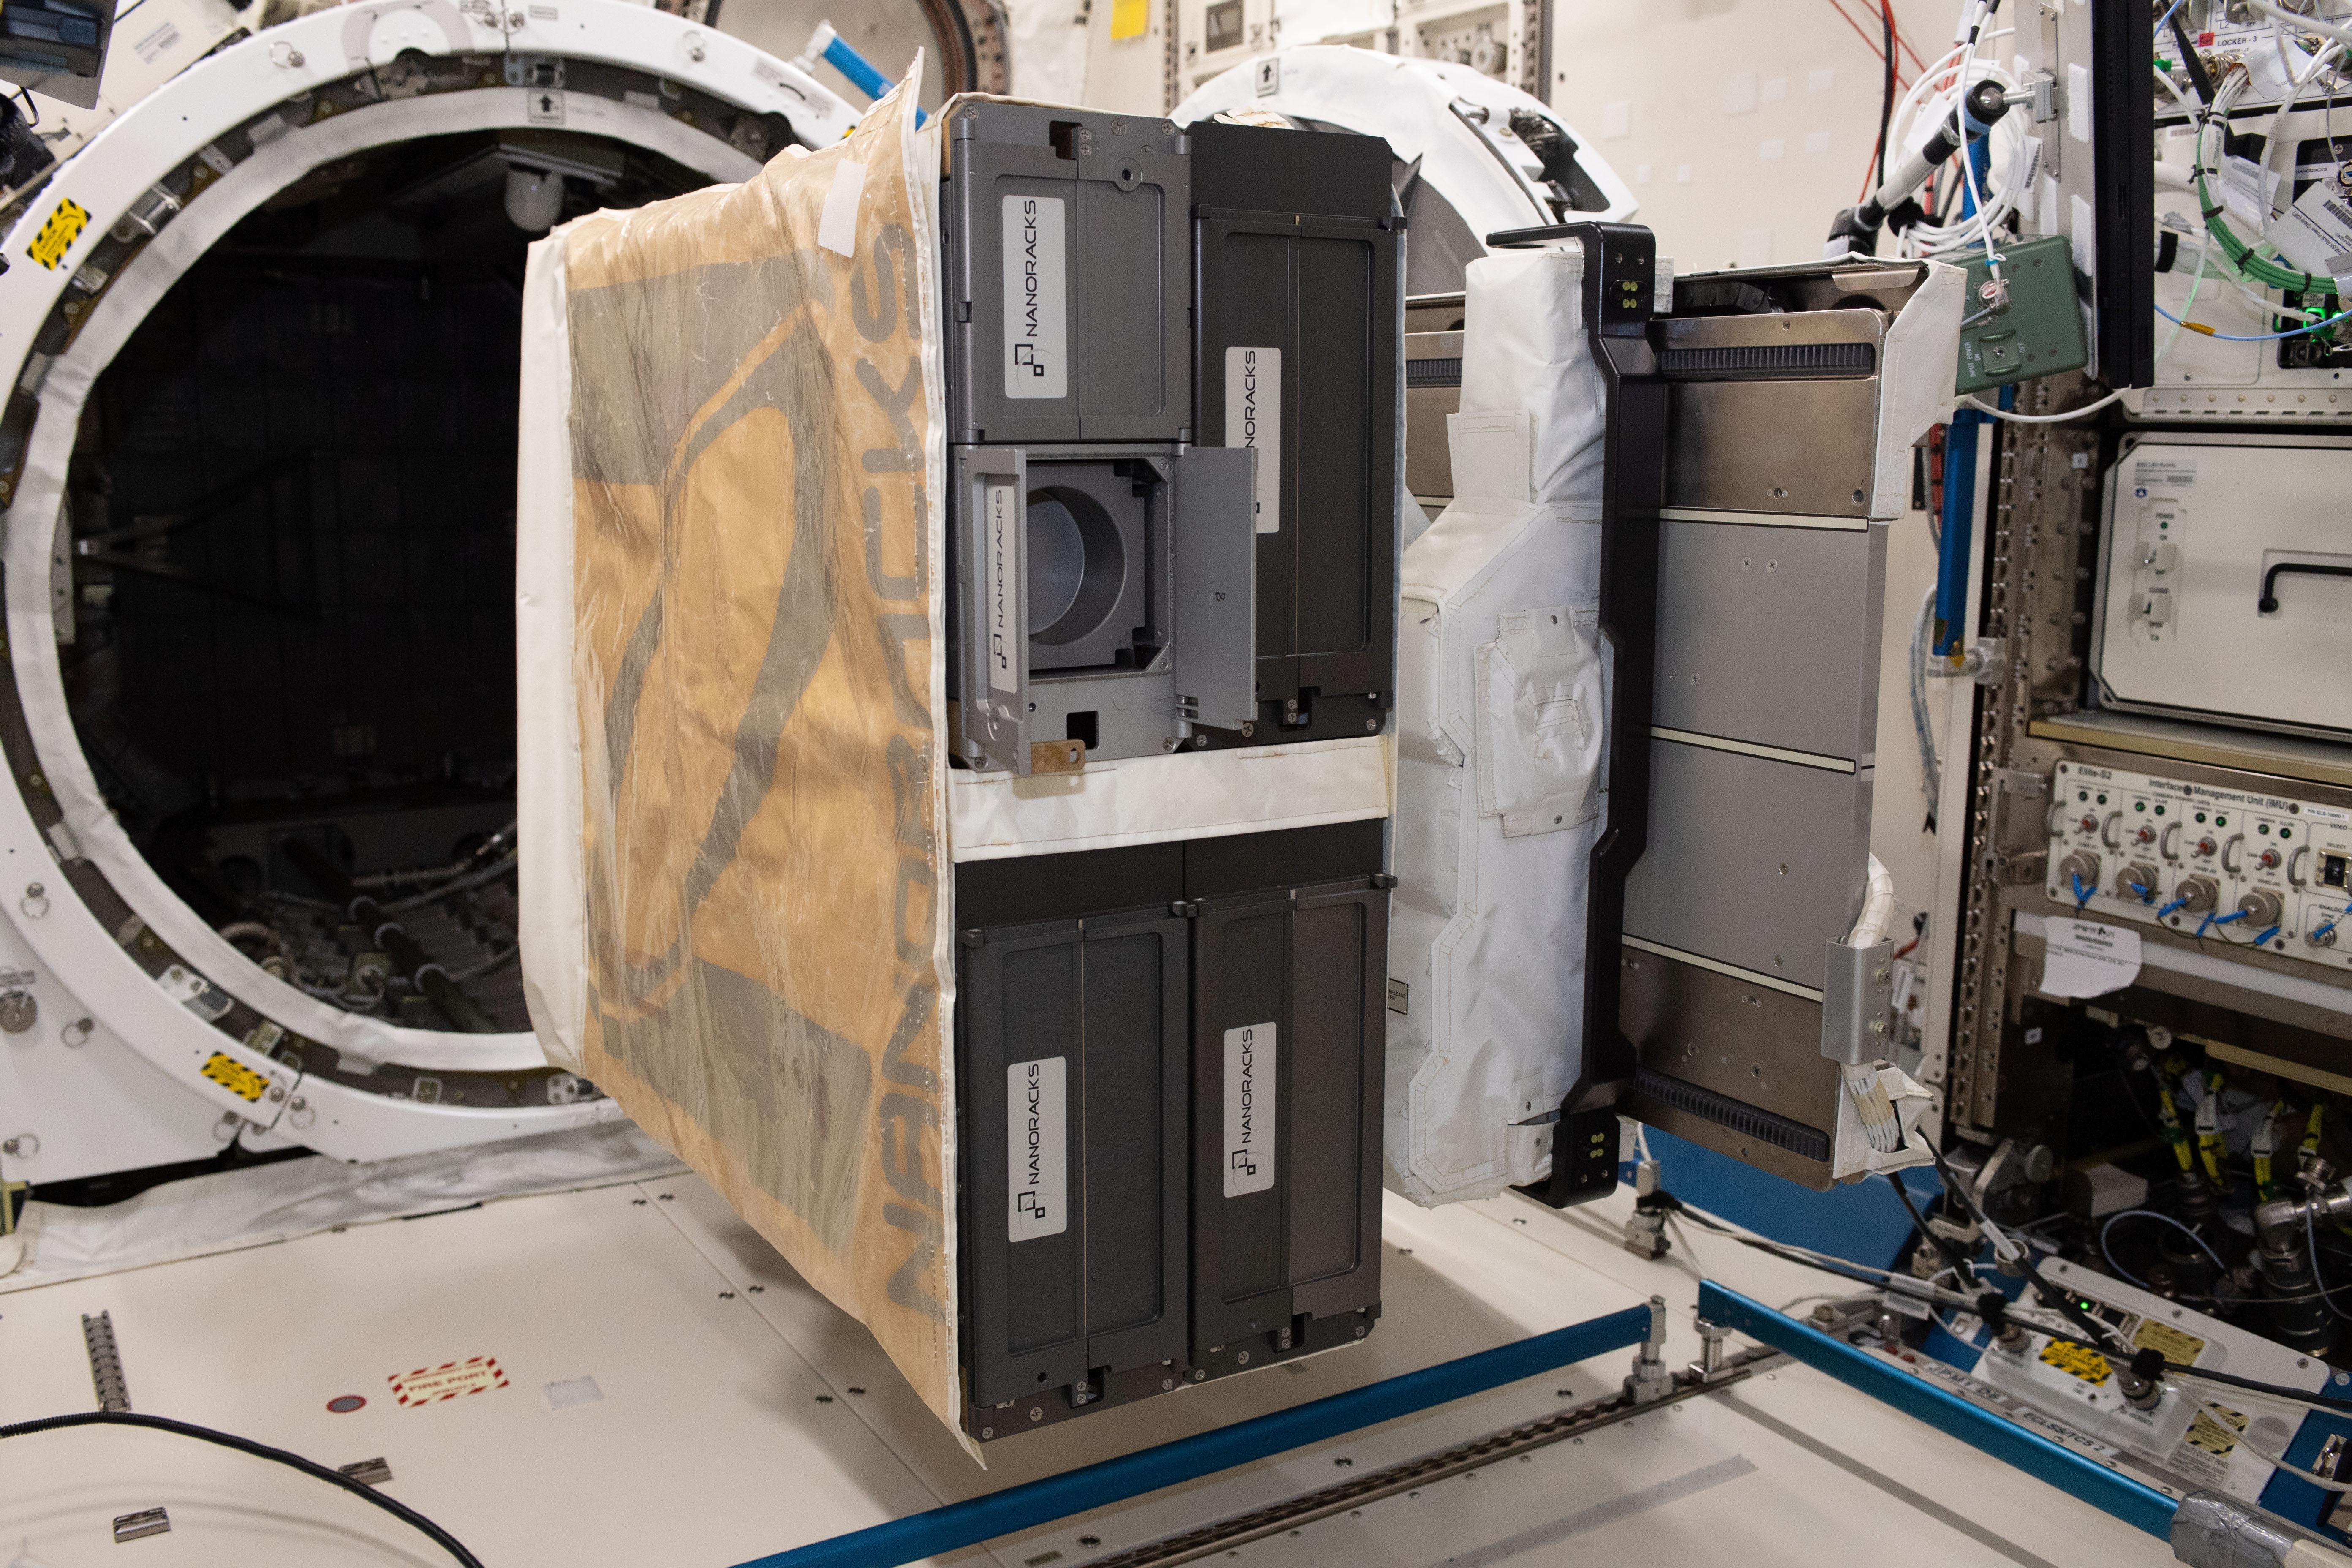 NASA - NanoRacks-EnduroSat One